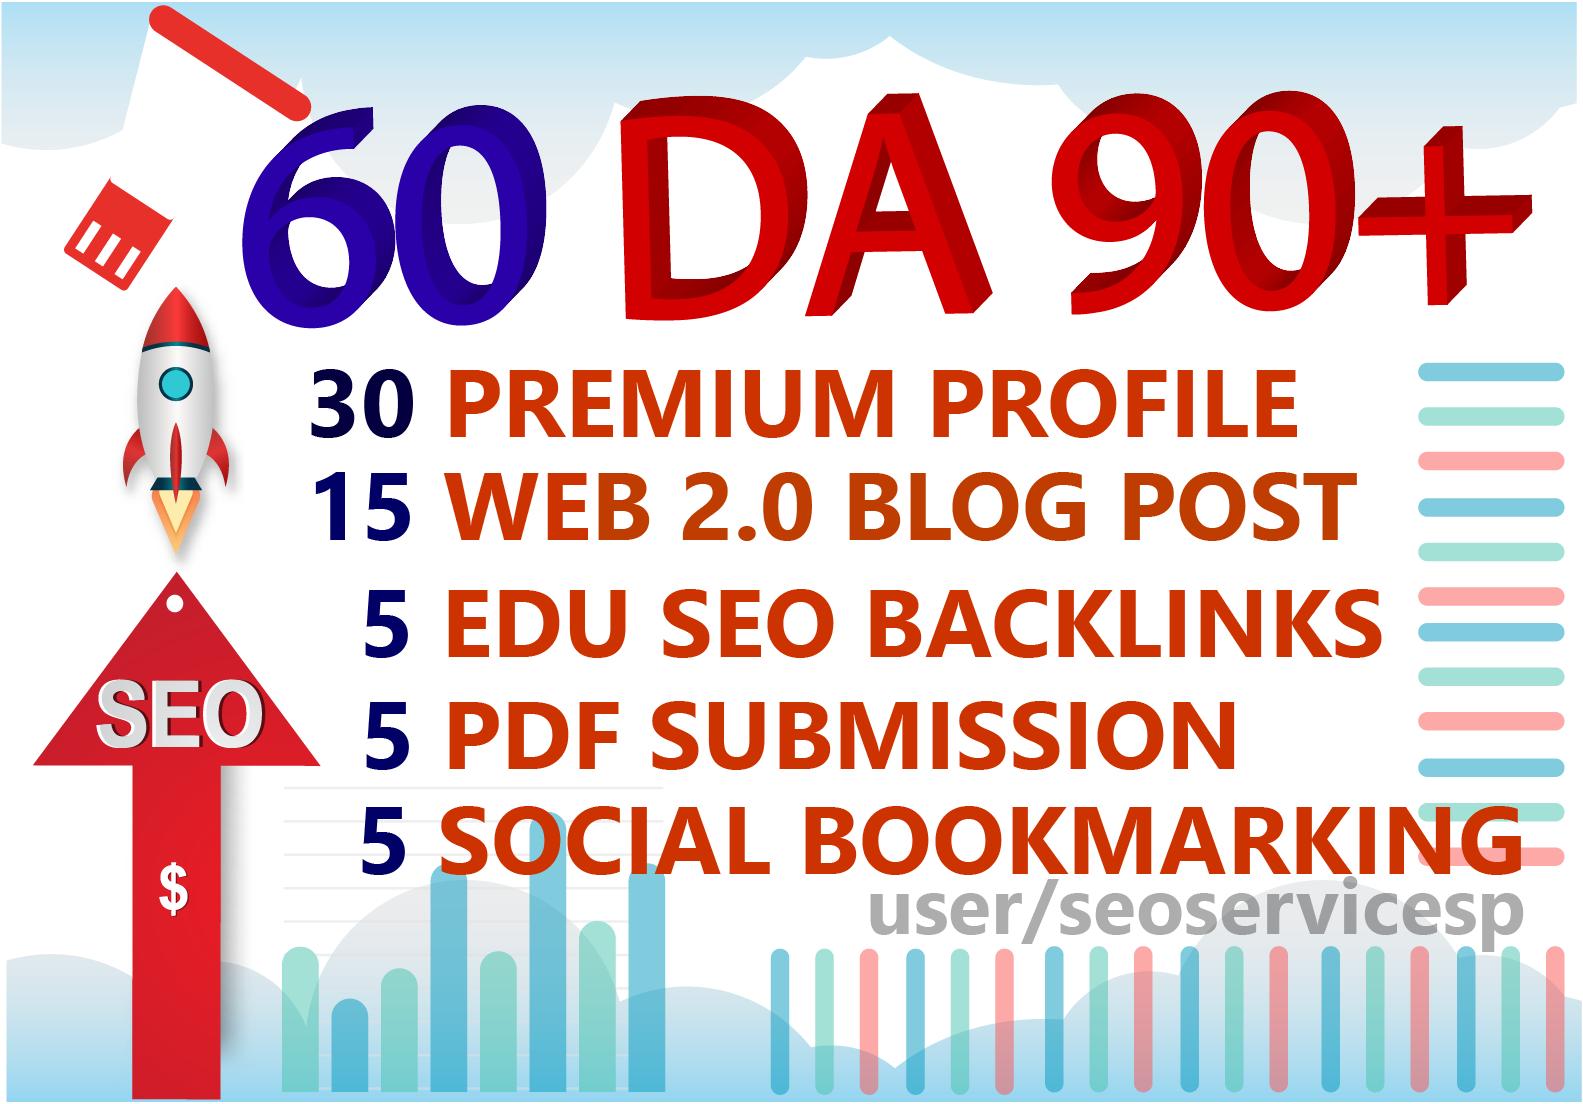 DA 90+ SEO Backlinks From 30 Profile + 15 Web 2.0 Blog + 5 Edu + 5 Pdf + 5 Social Bookmarking